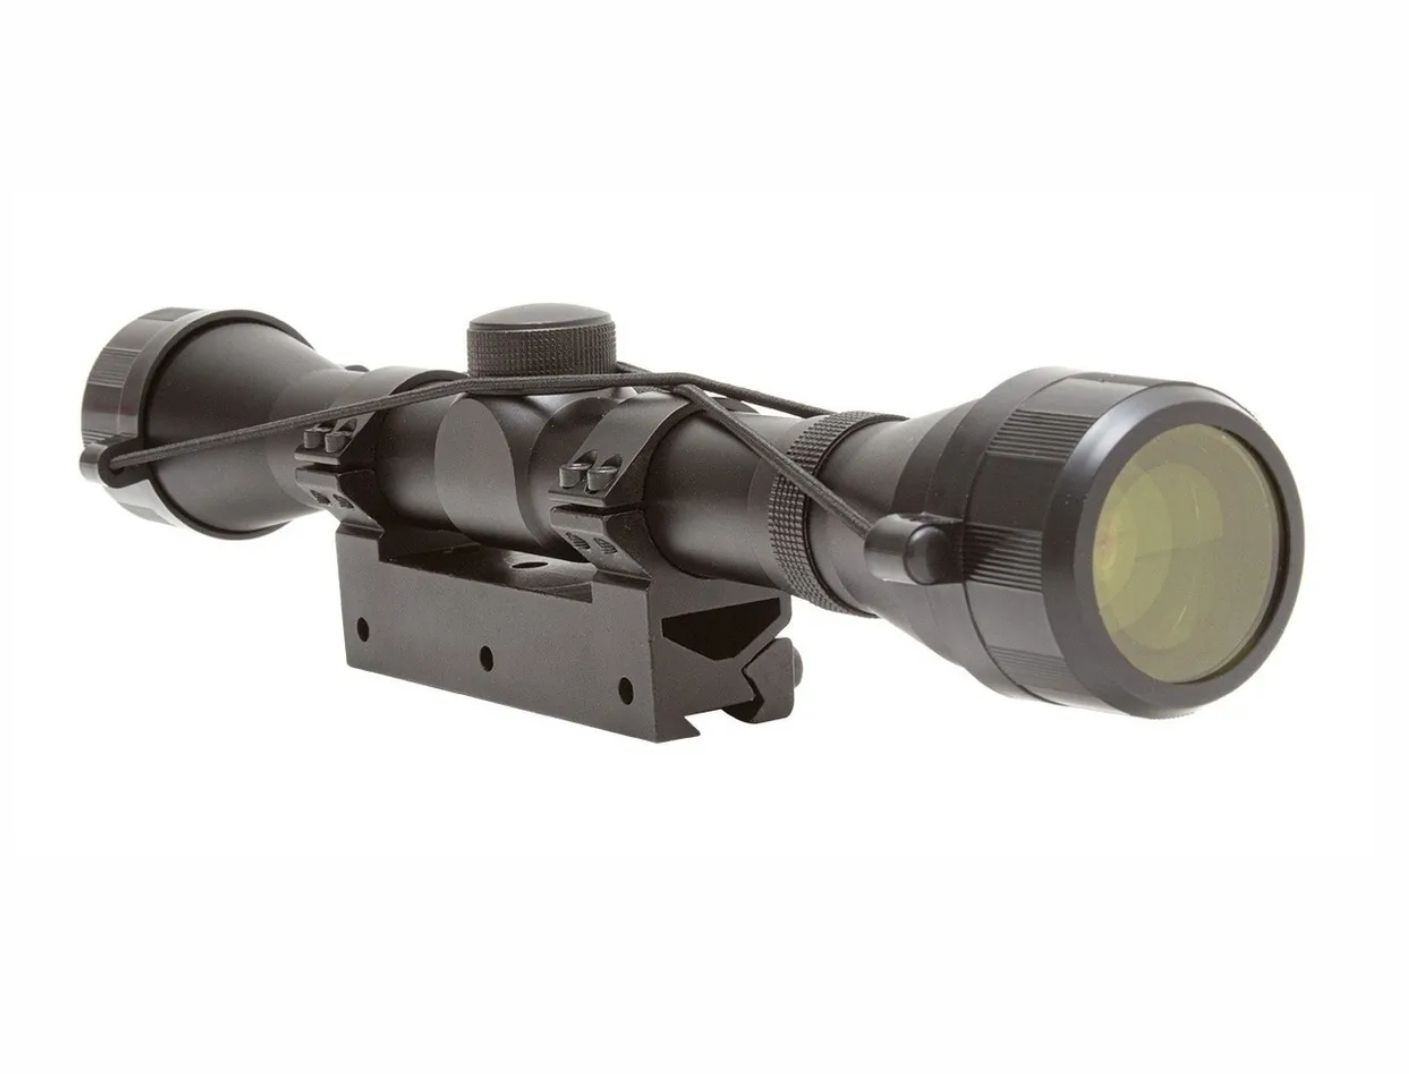 Carabina De Pressão Pcp Pr900w 5.5mm c x32 Mount unico